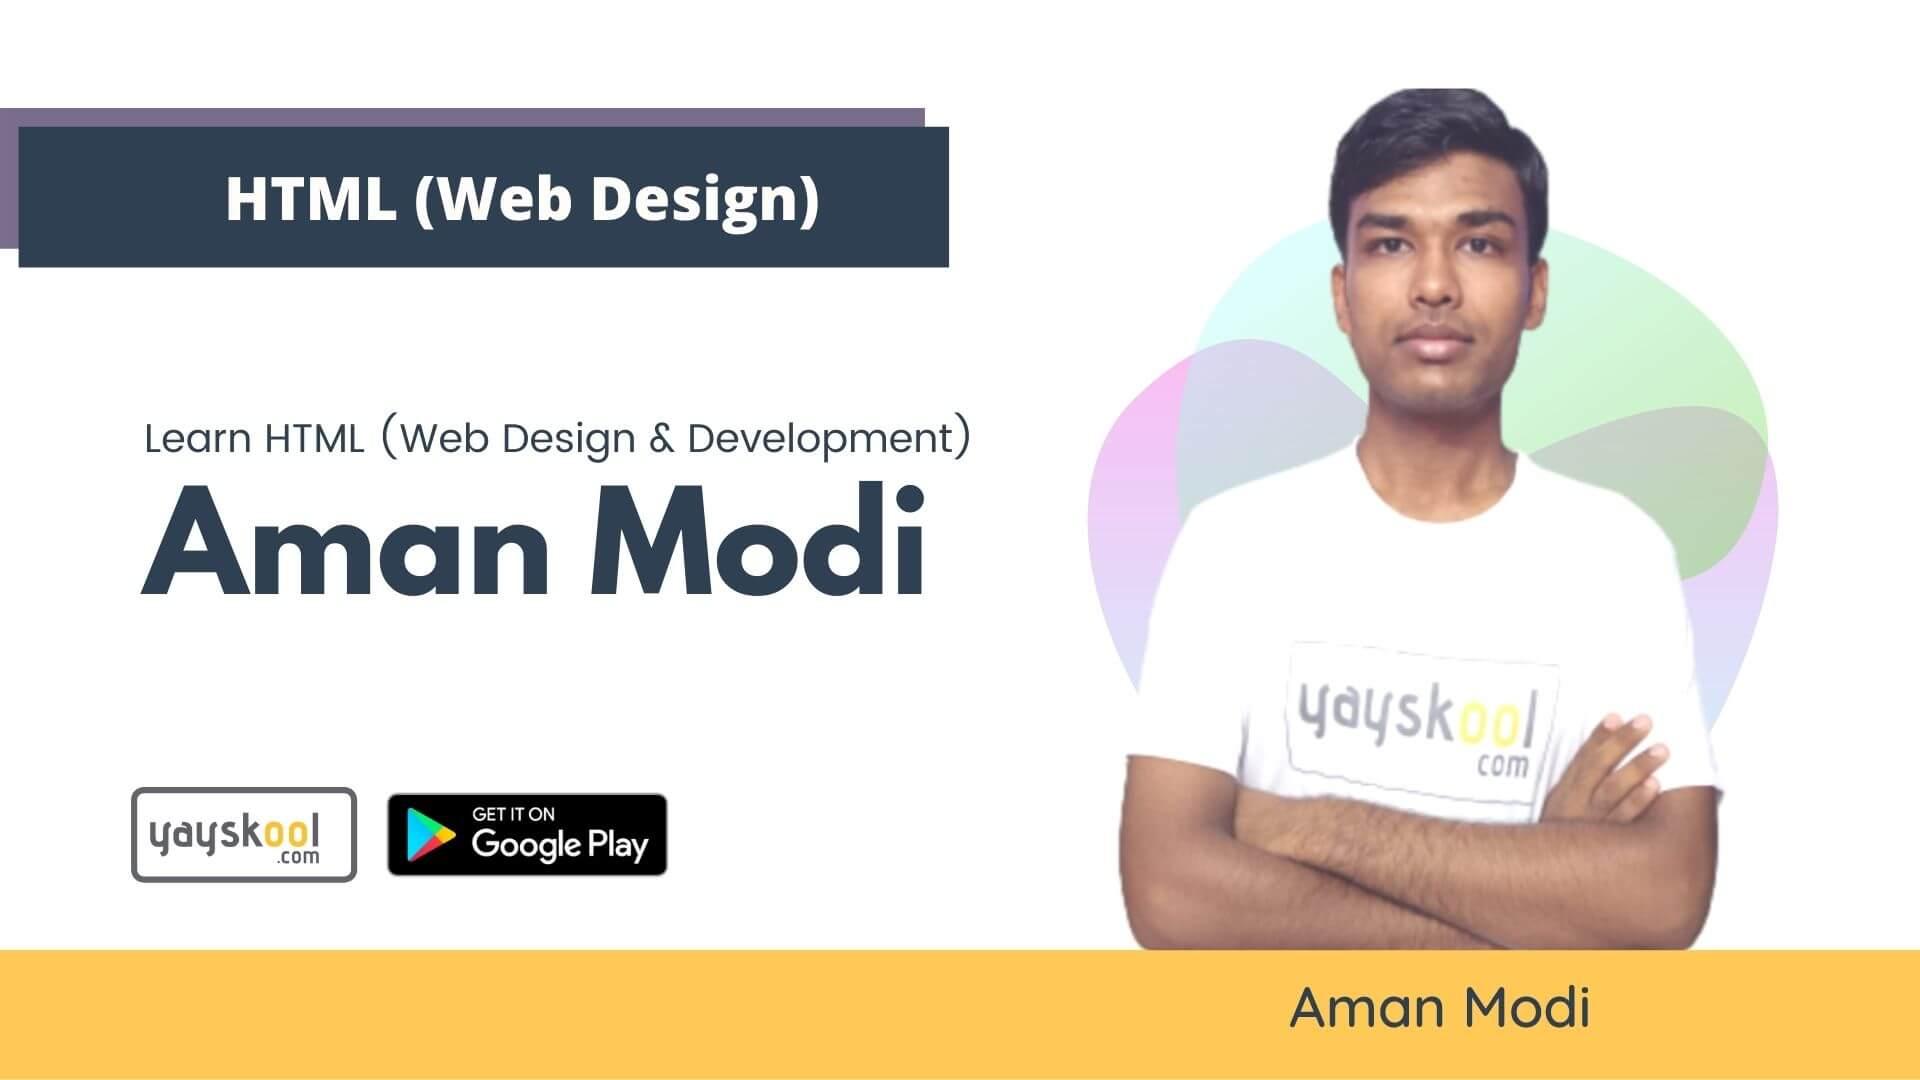 html-web-design-course-aman-modi